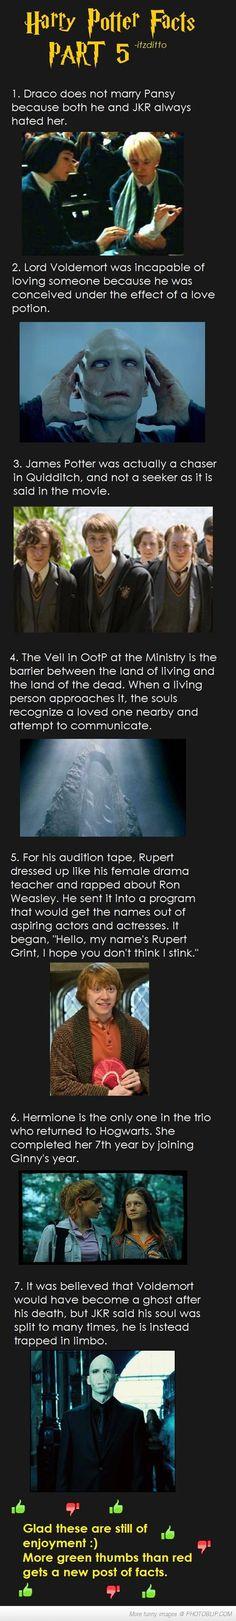 Harry Potter Facts Part Five